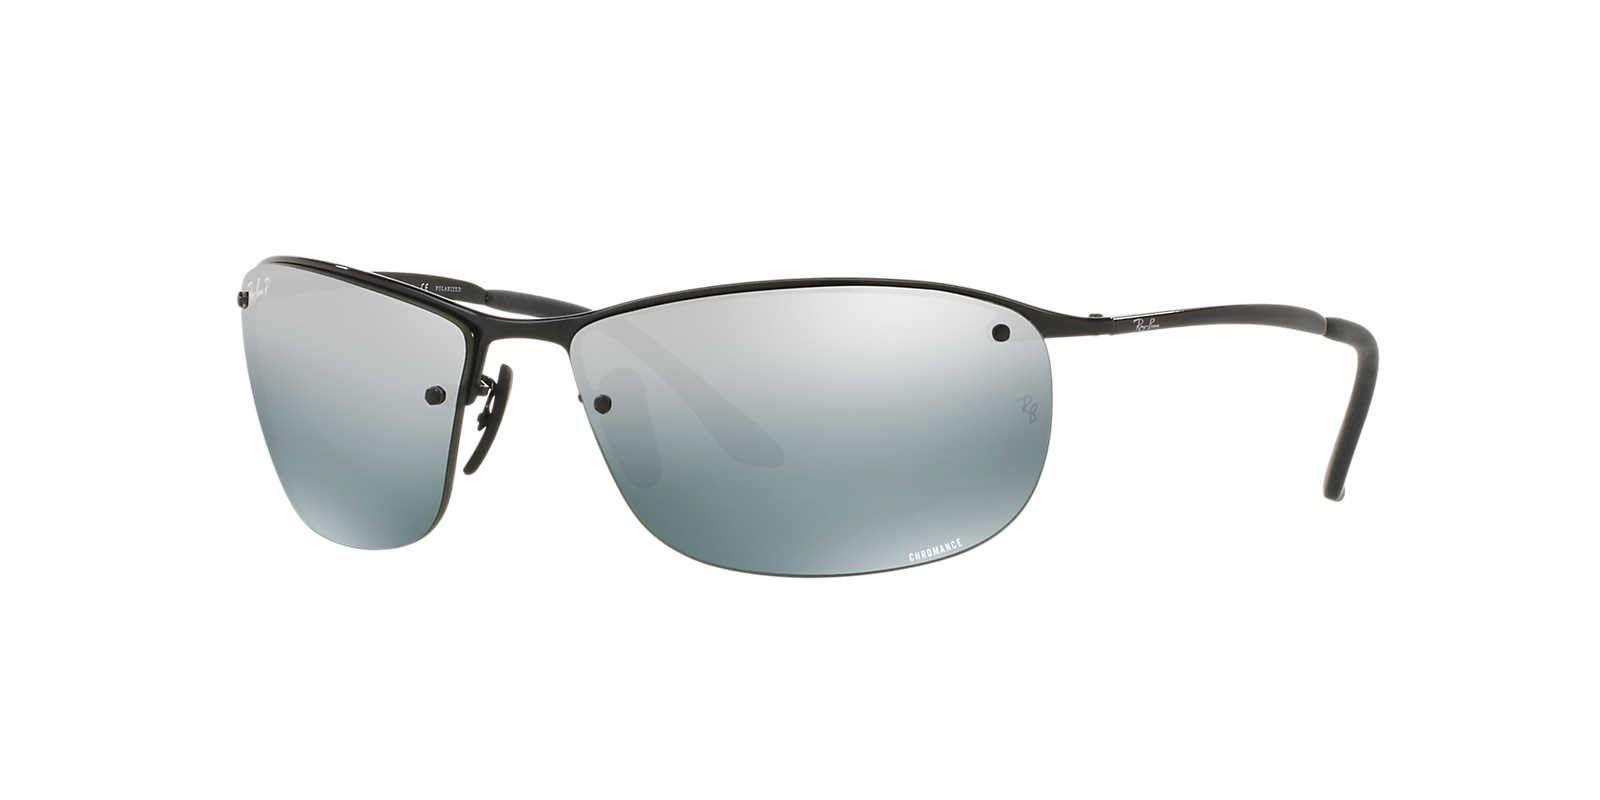 25f53ed83a RayBan RB3542 Chromance Lens Wrap Sunglasses Black Frame Grey Mirror Lens  002 5L